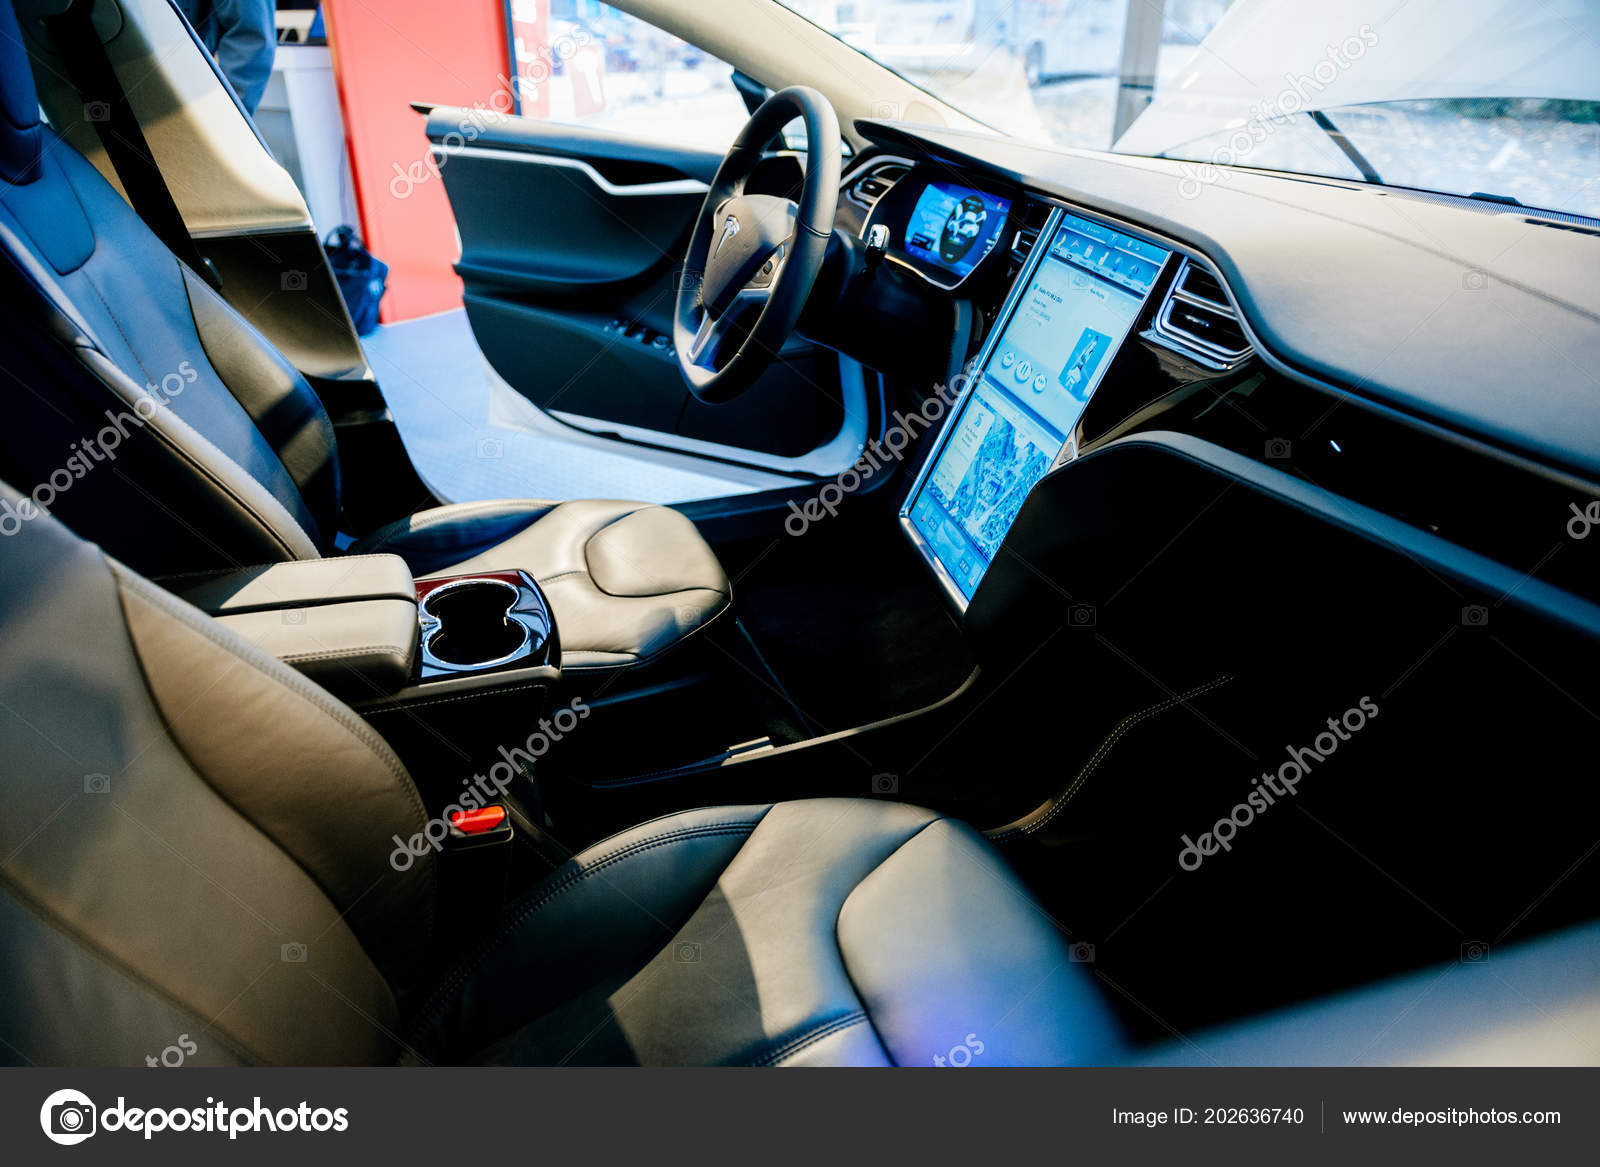 Neue Tesla Model S-Innenarchitektur — Redaktionelles Stockfoto ...